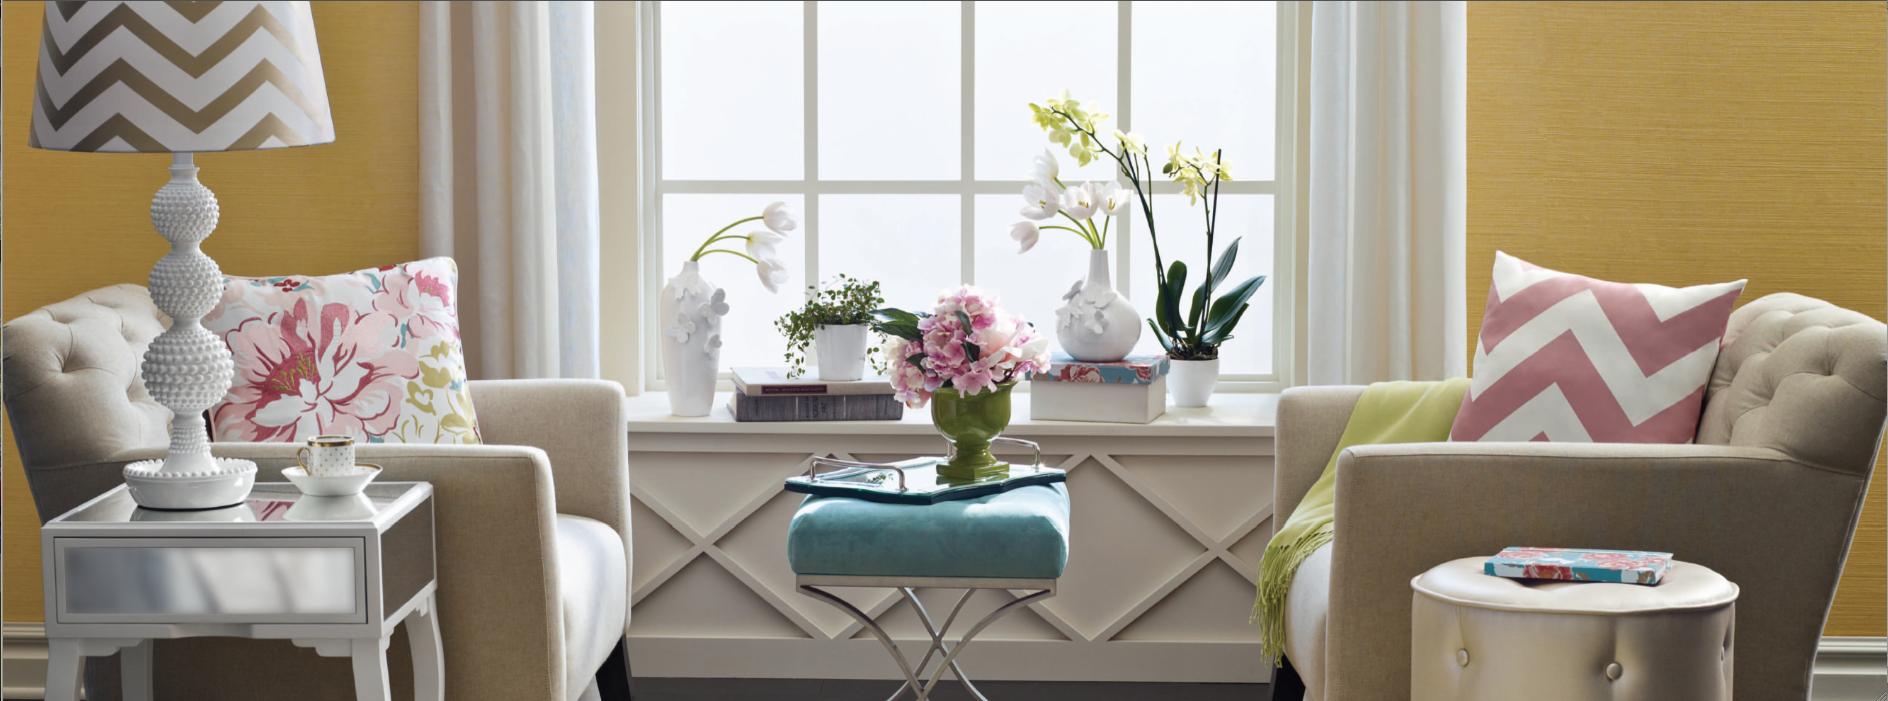 unique-home-decor-accessories-hdhome-accessories-and-decor-decorating-ideas-wddcfkjm.png